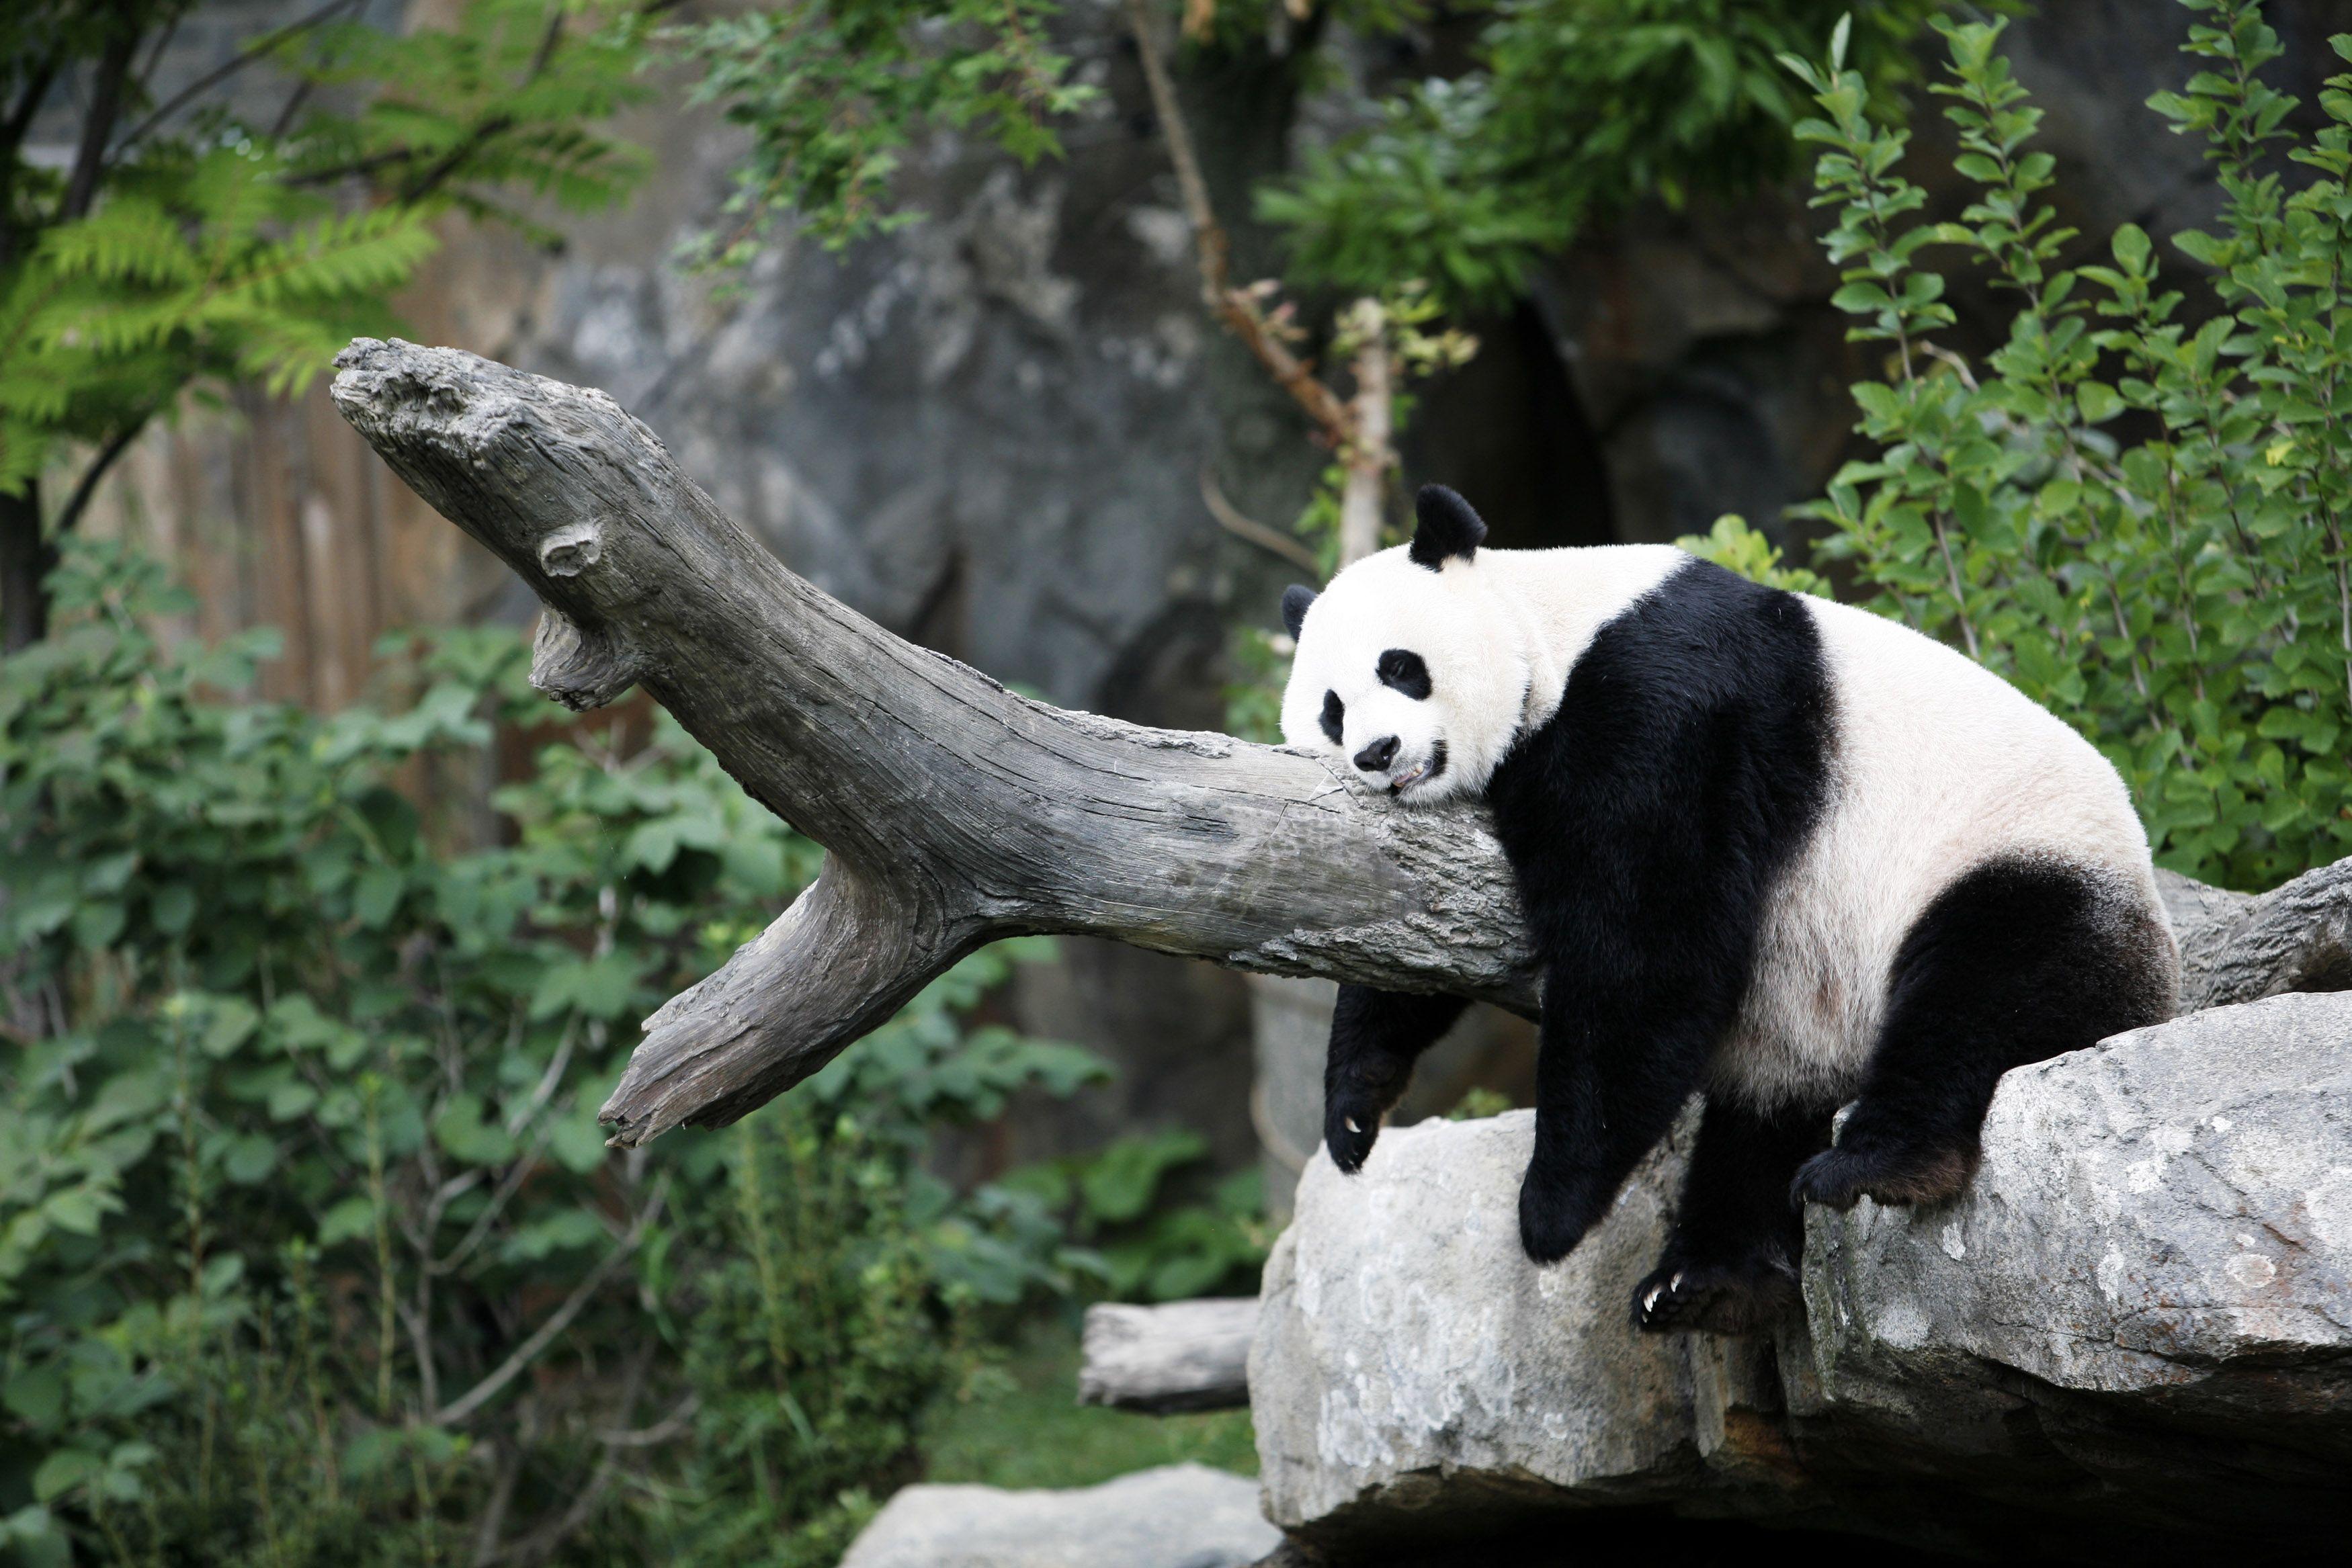 Sleeping Panda Wallpapers Top Free Sleeping Panda Backgrounds Wallpaperaccess